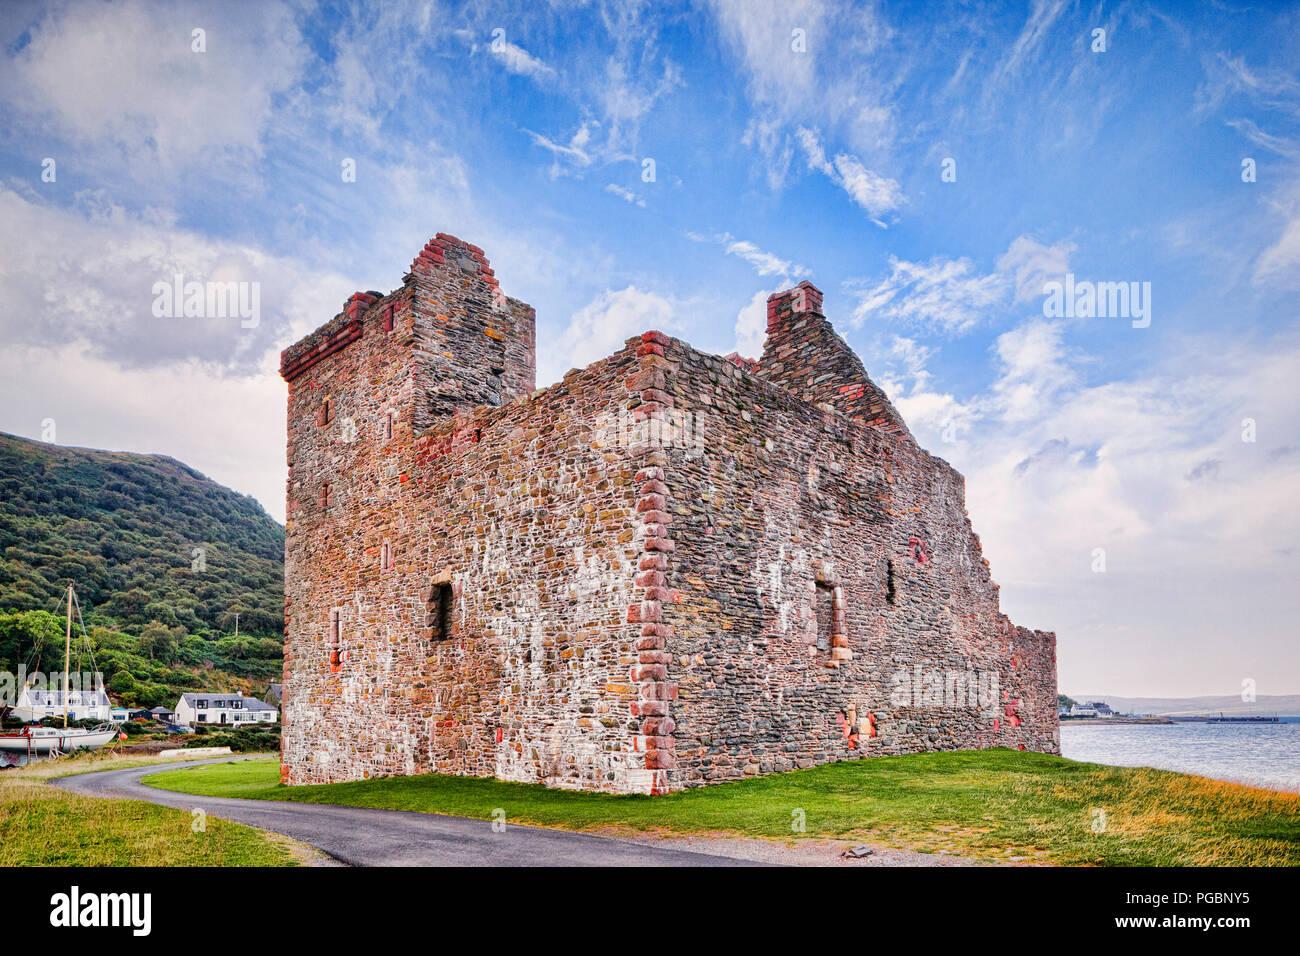 Lochranza Castle on the island of Arran, North Ayrshire, Scotland - Stock Image